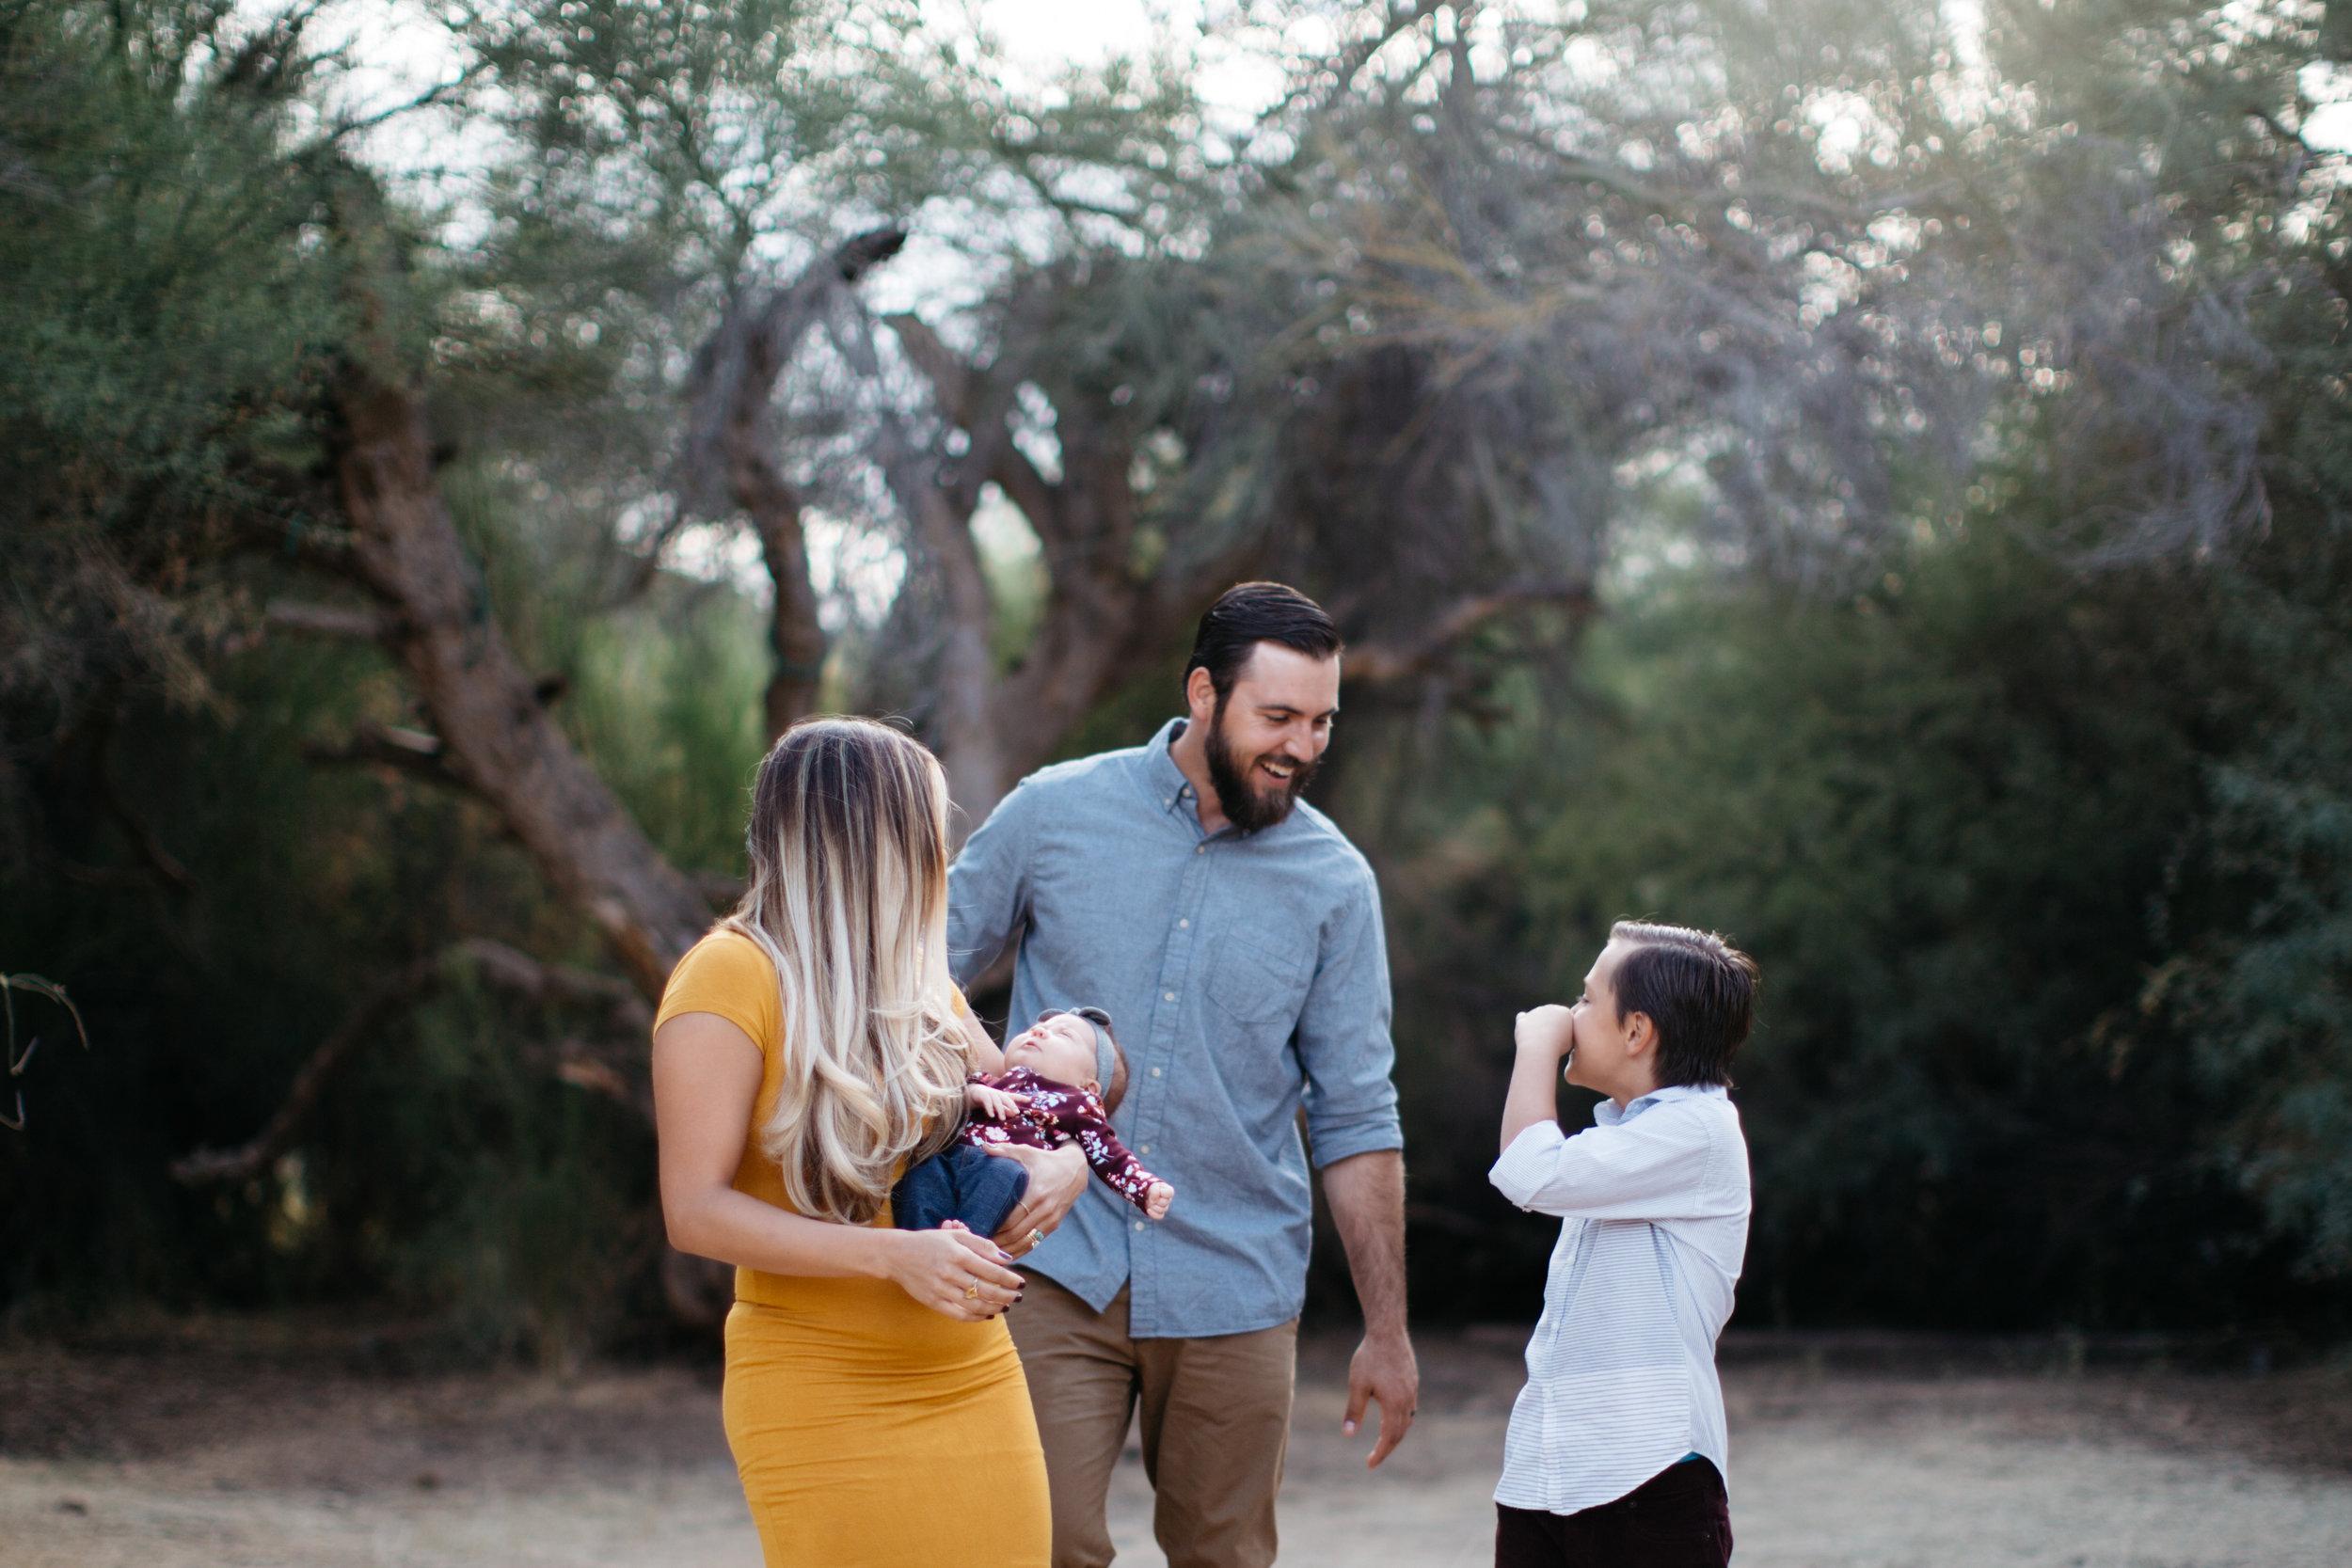 phoenix-family-photography-elan-photographie-studio-7.jpg